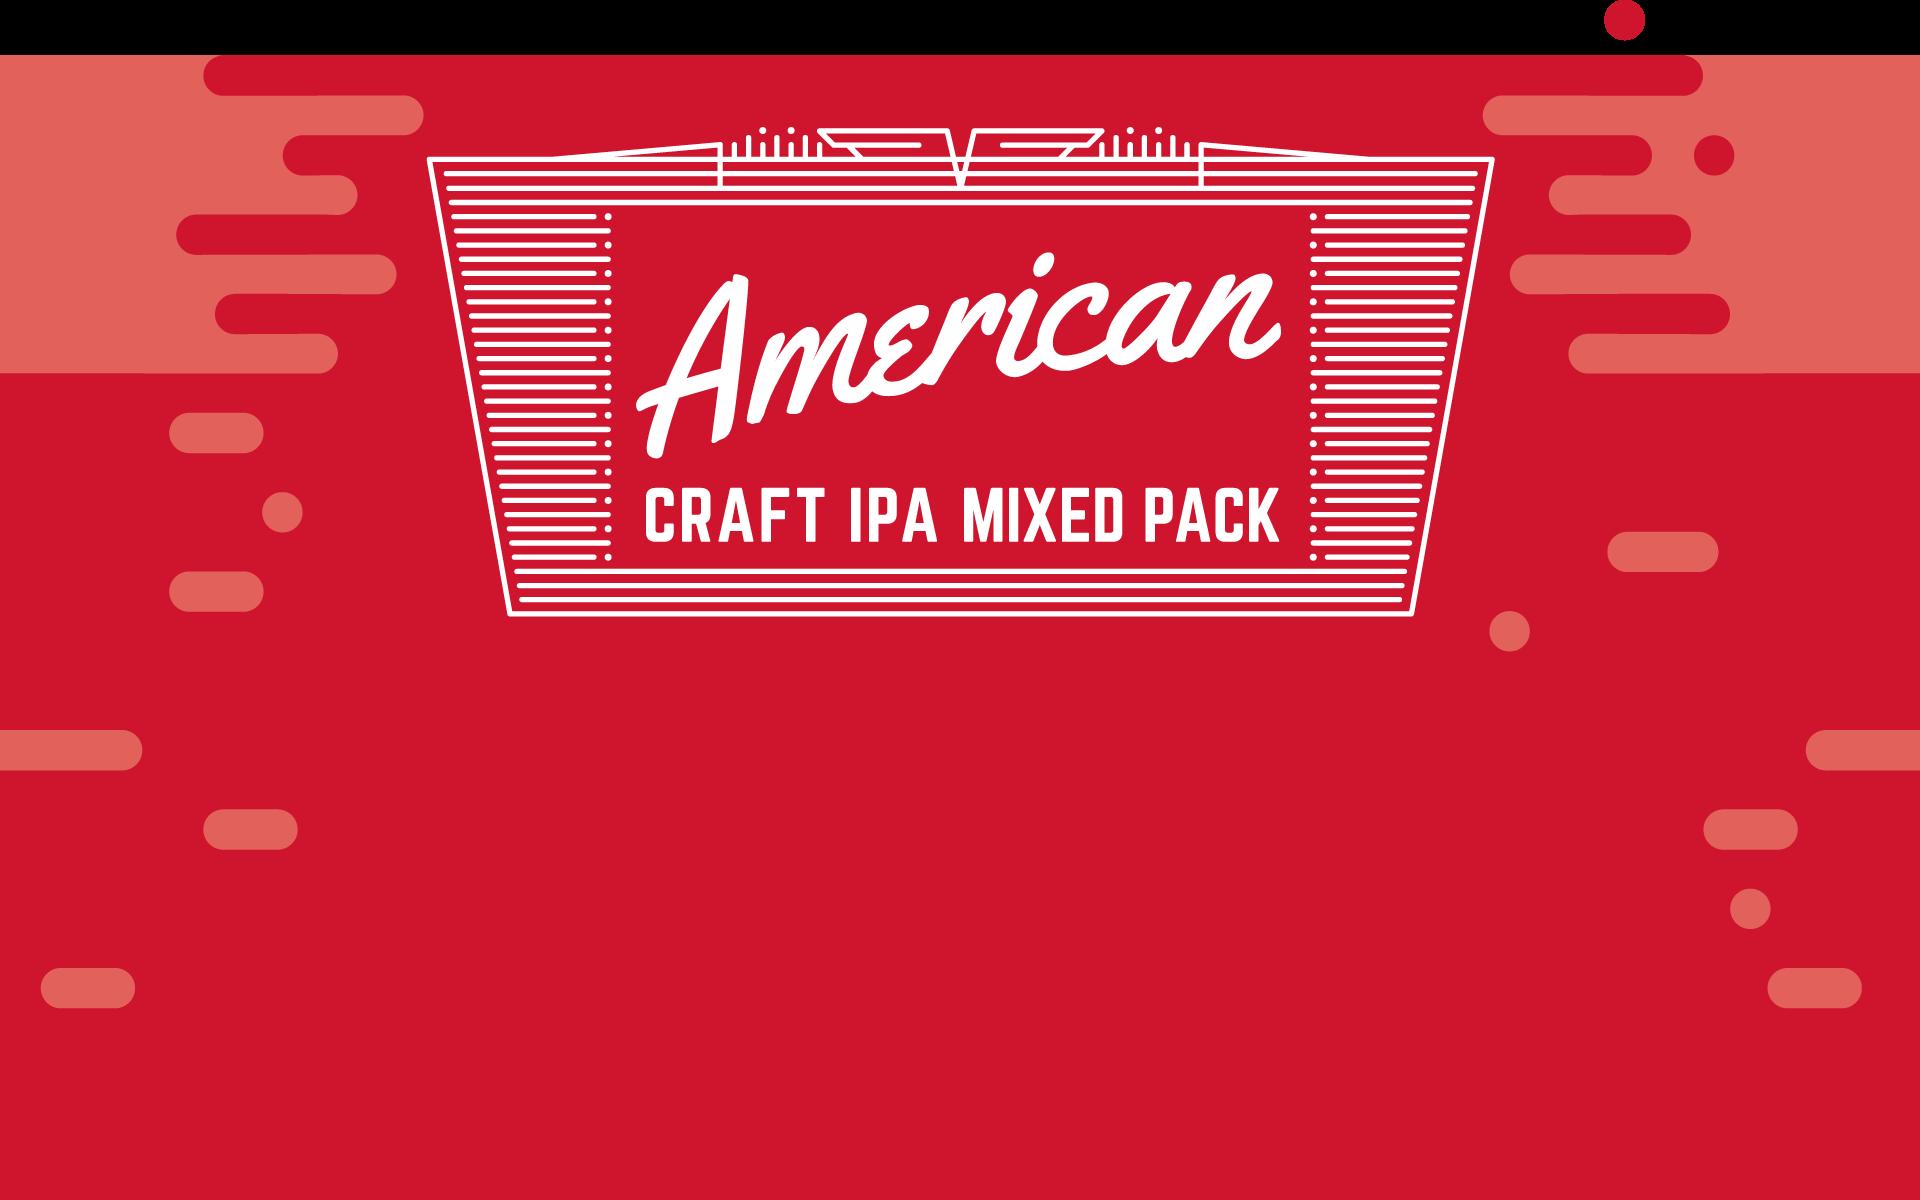 James Clay American Craft IPA Illustration